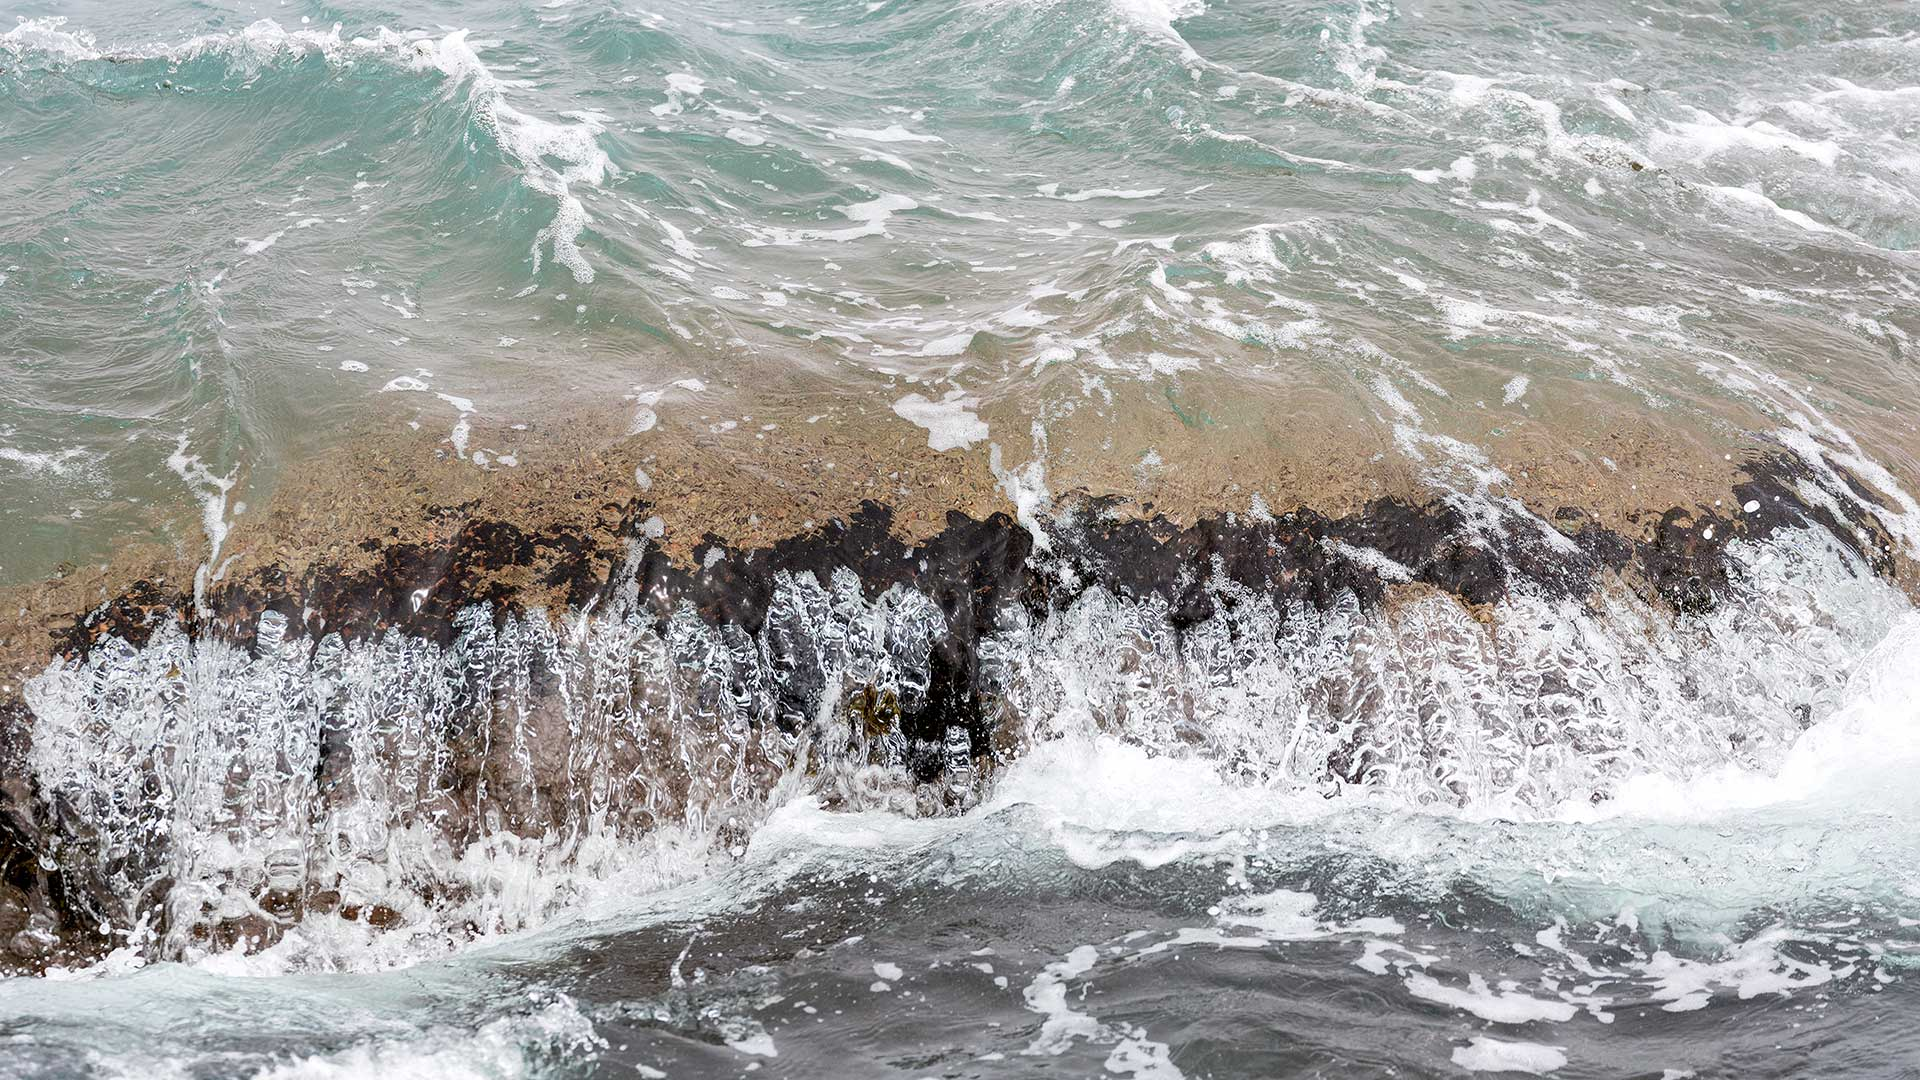 Landschaftsfotografie: Côte de Granit Rose – Wehr am Meer | Foto: Dieter Eikenberg, imprints